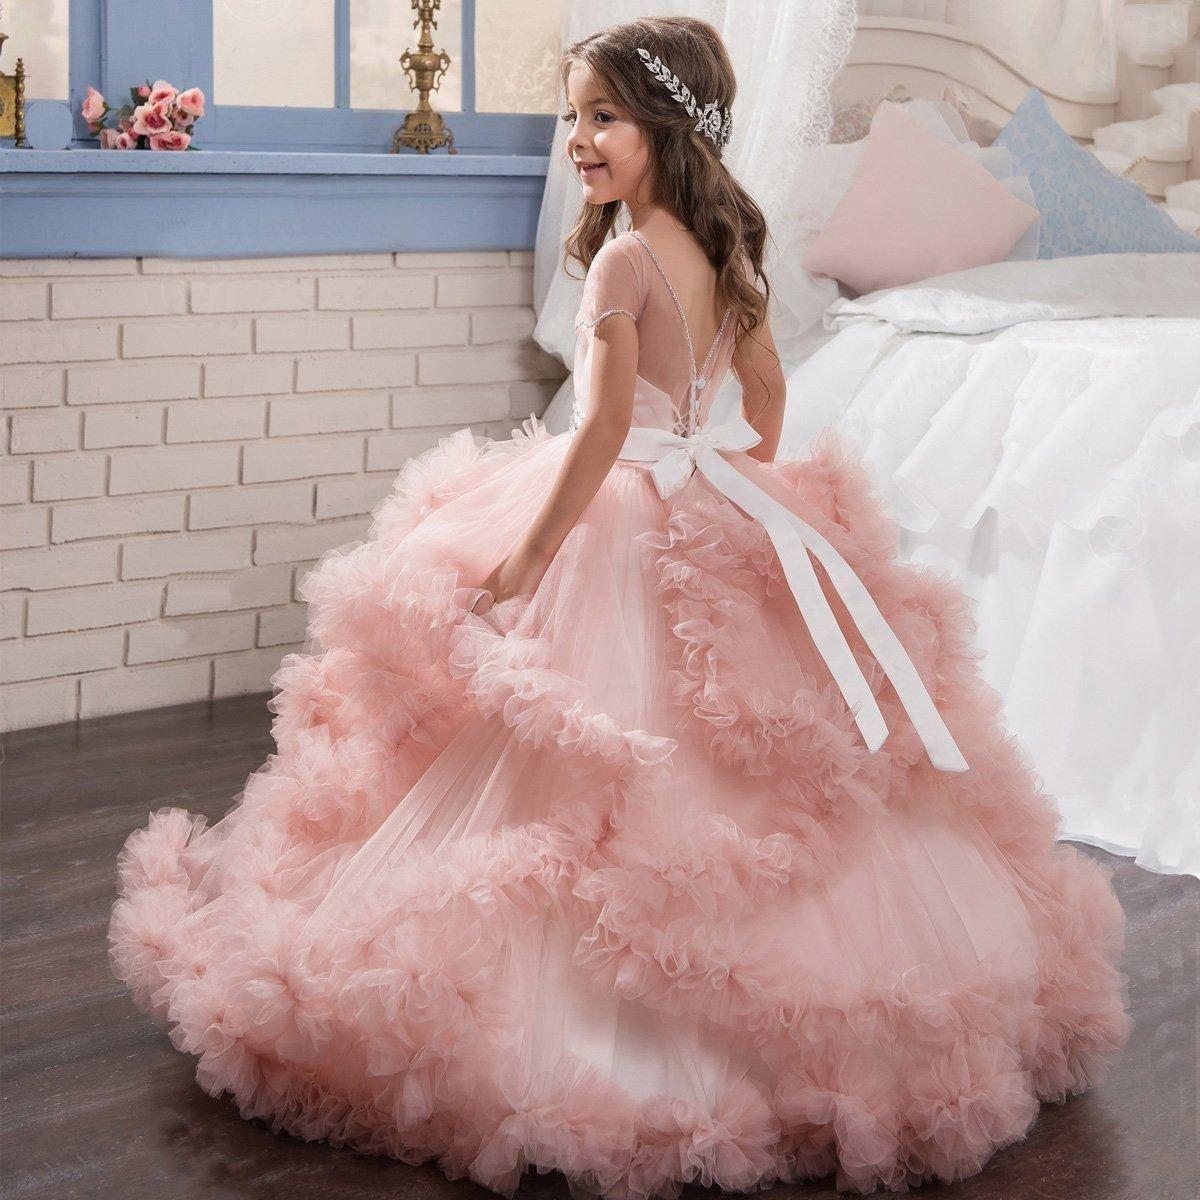 Blush Pink Girls Pageant Dresses 2018 Ball Gowns Cascading Ruffles ...